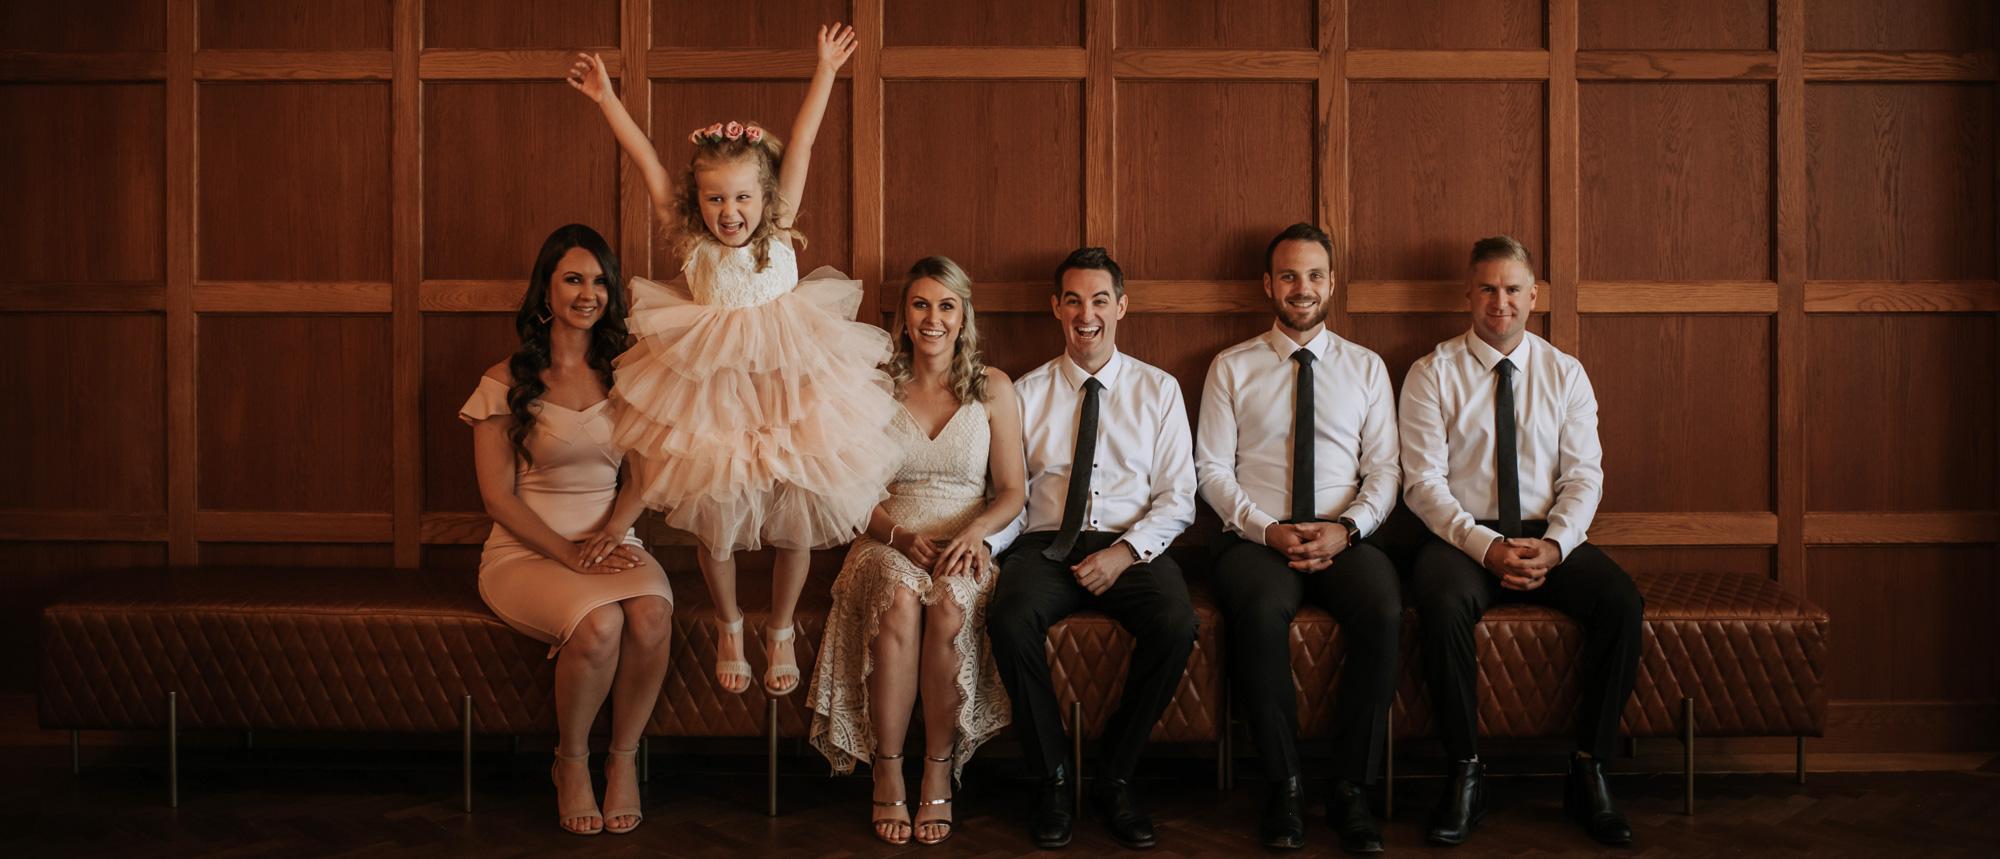 The Island Gold Coast Wedding